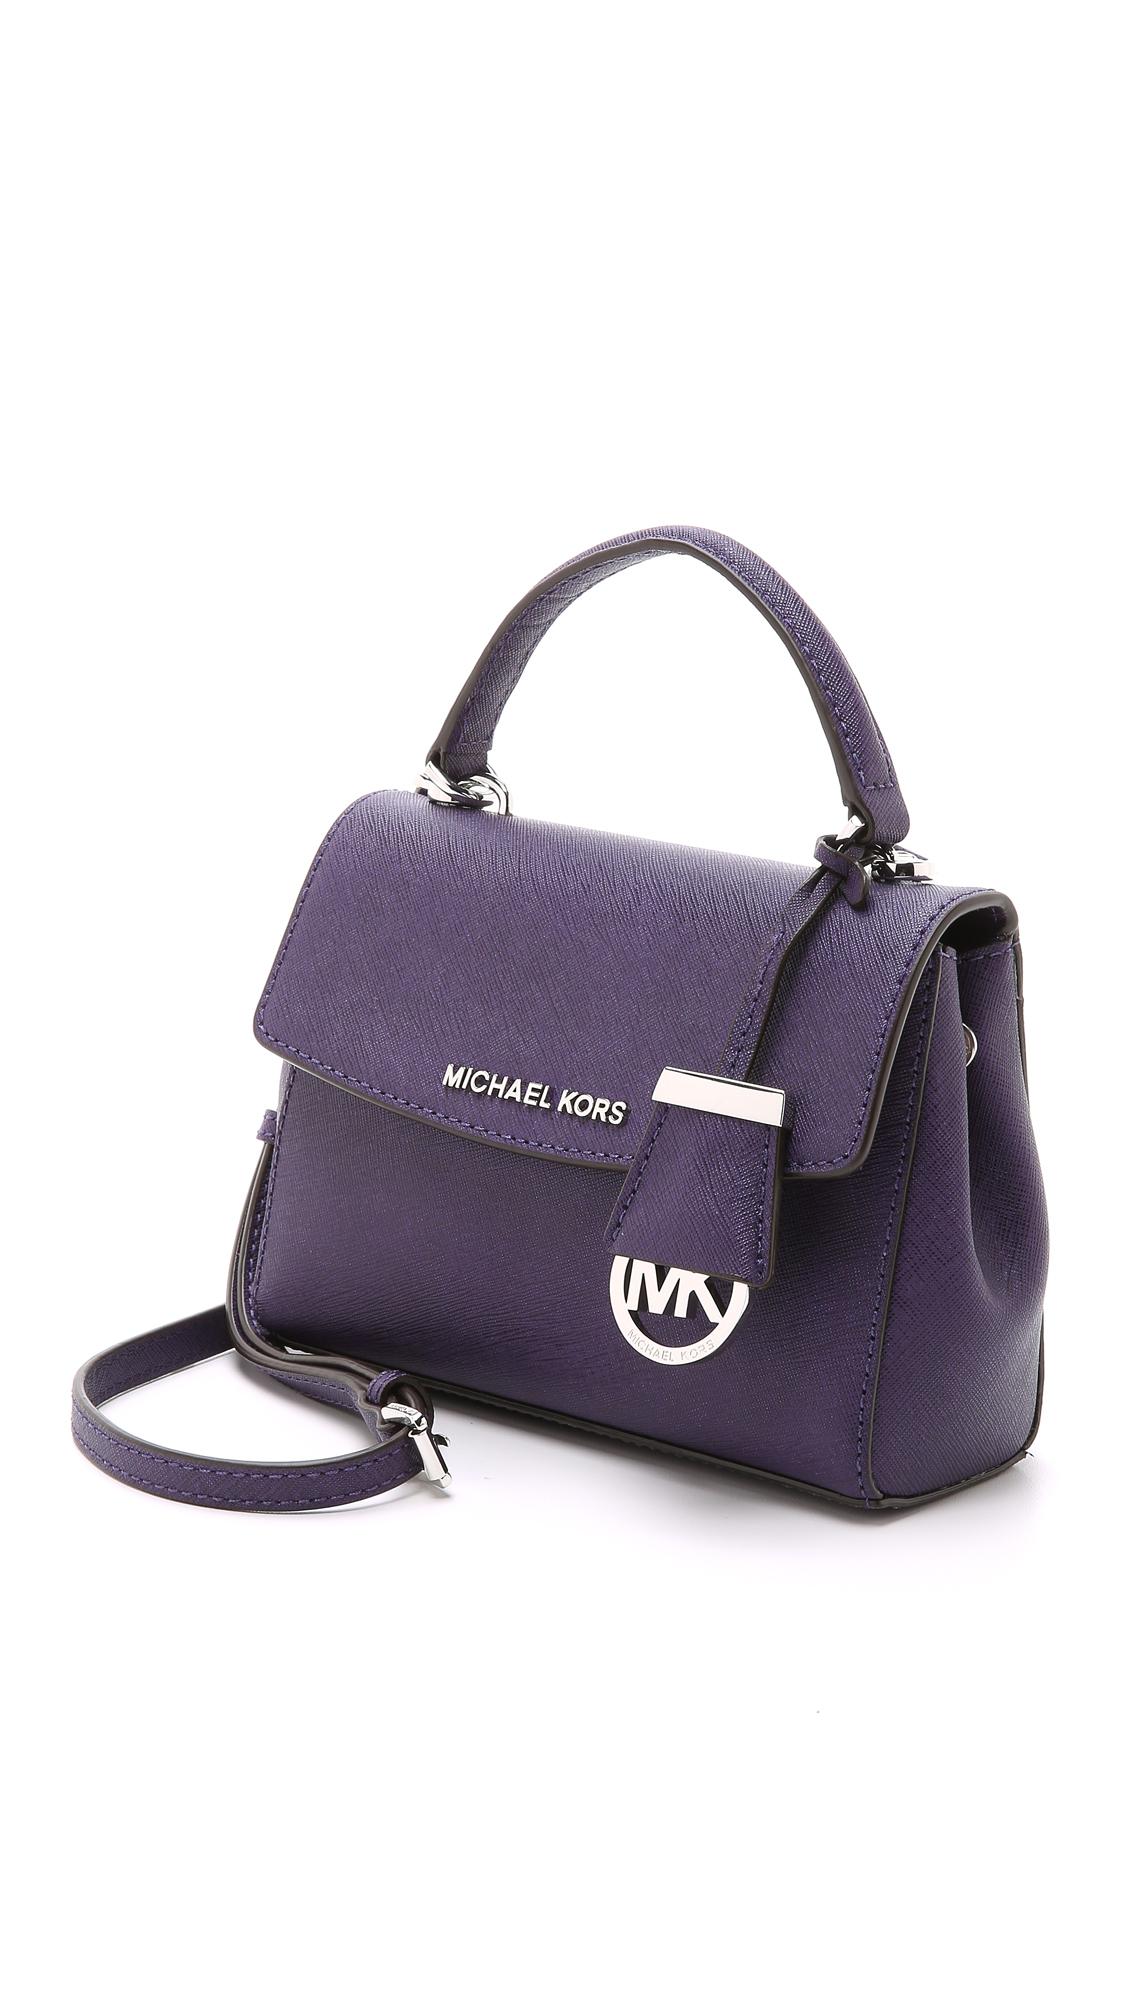 MICHAEL Michael Kors Ava Cross Body Bag - Iris in Blue